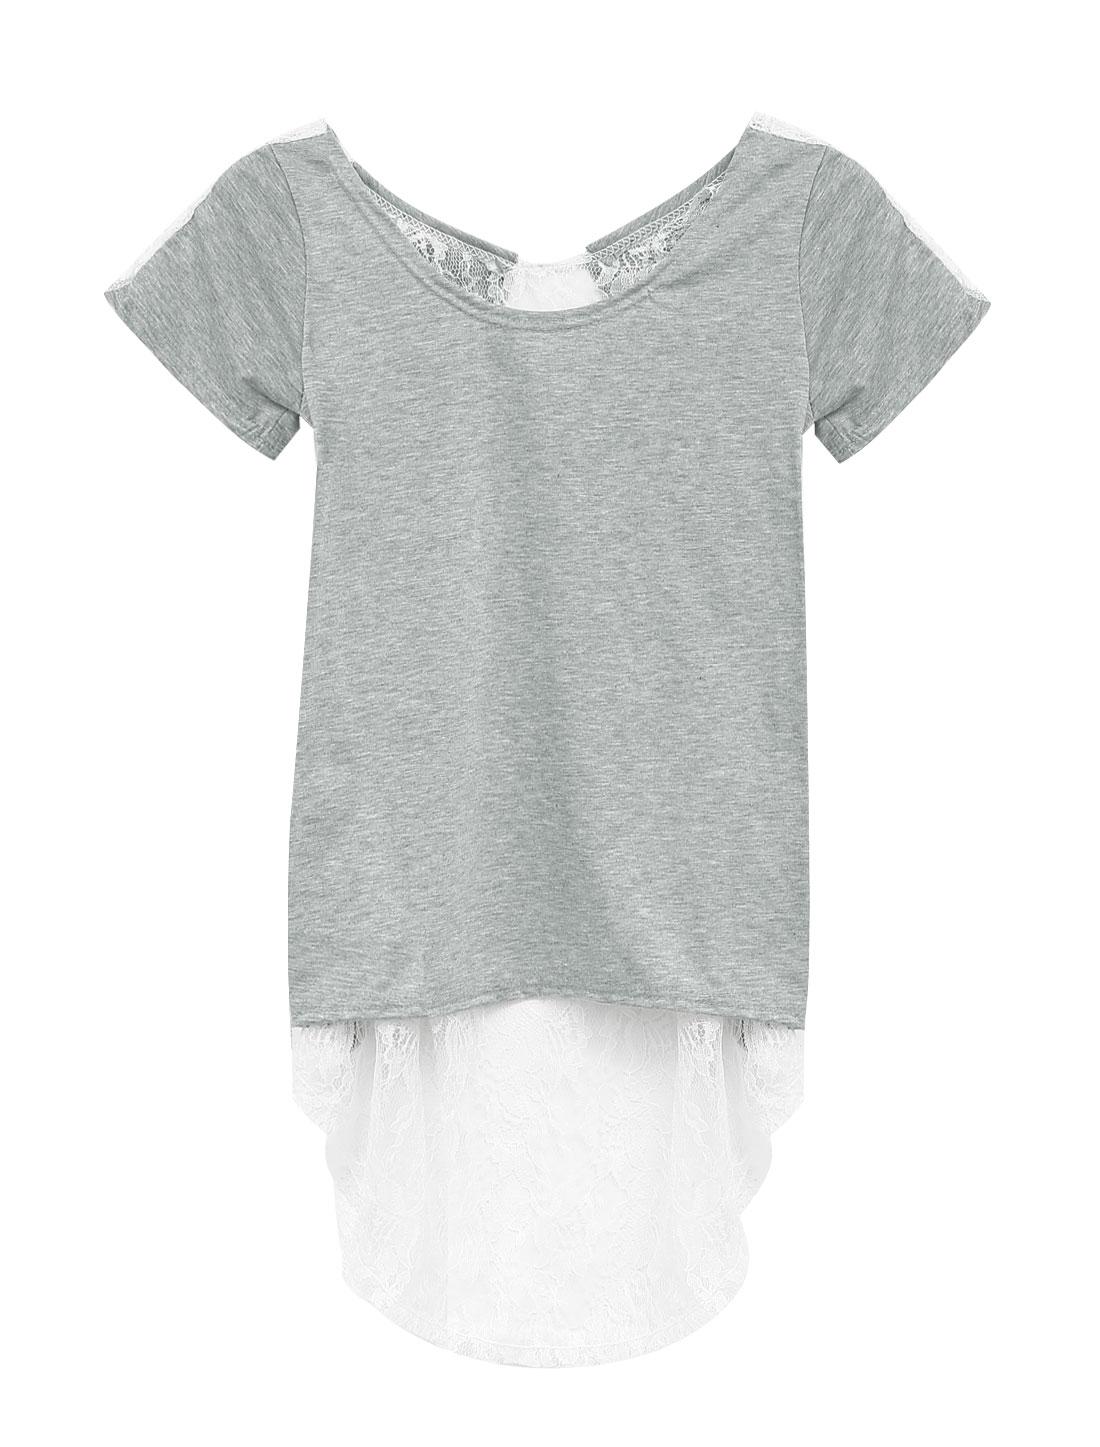 Lady's Short Sleeve Scoop Neck Asymmetrical Hem Lace Panel Tee Shirt Gray XS